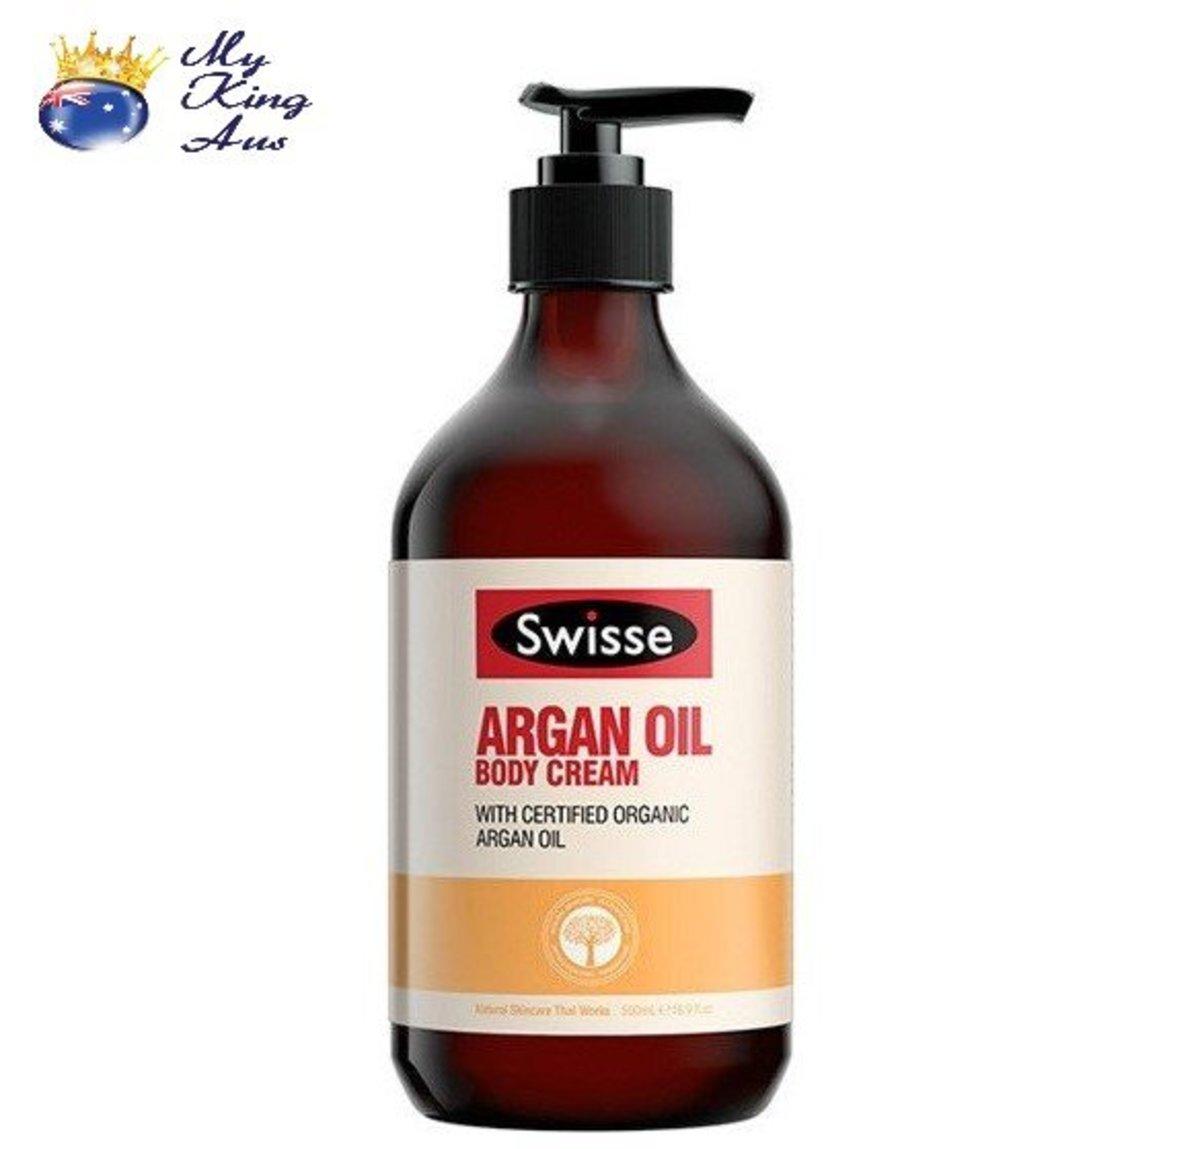 Argan Oil Body Cream 500ml